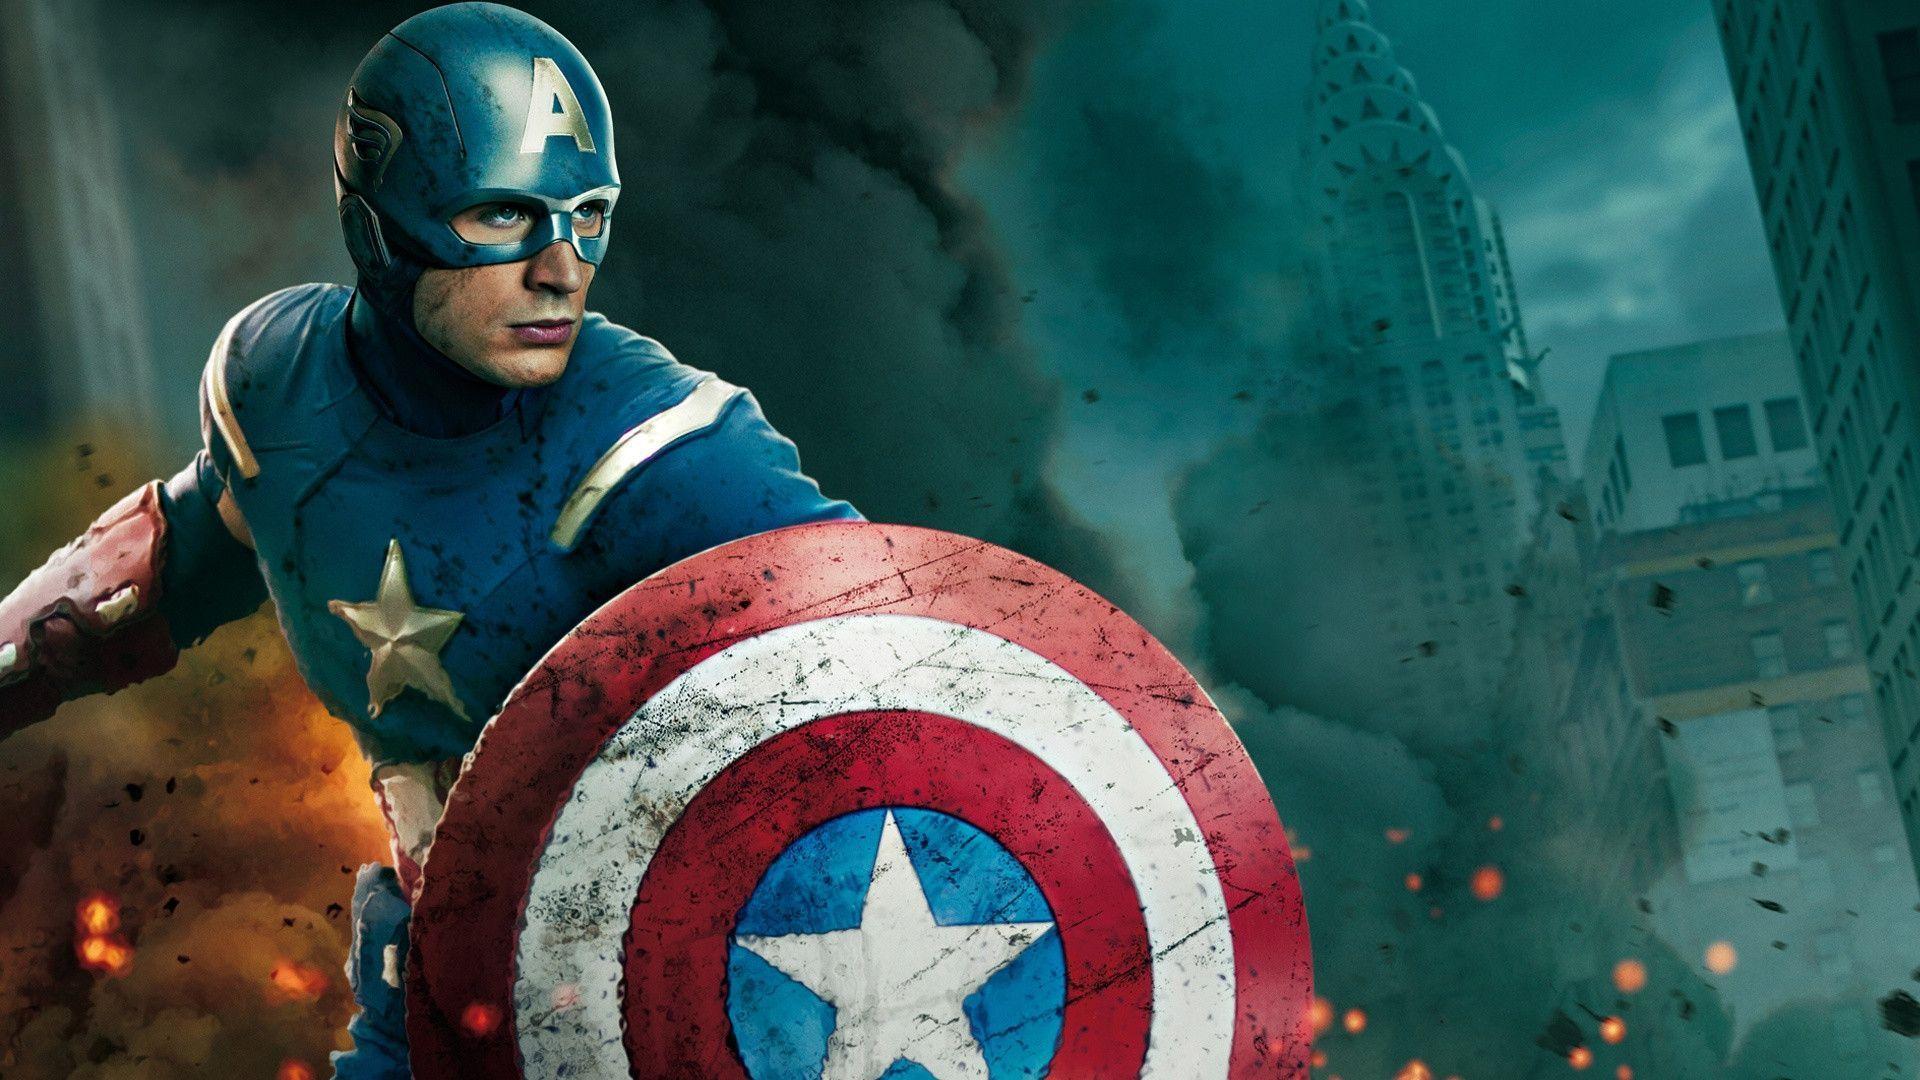 Hd wallpaper superhero - The Avengers Wallpaper Hd Avengers Hd Live Images Hd Wallpapers